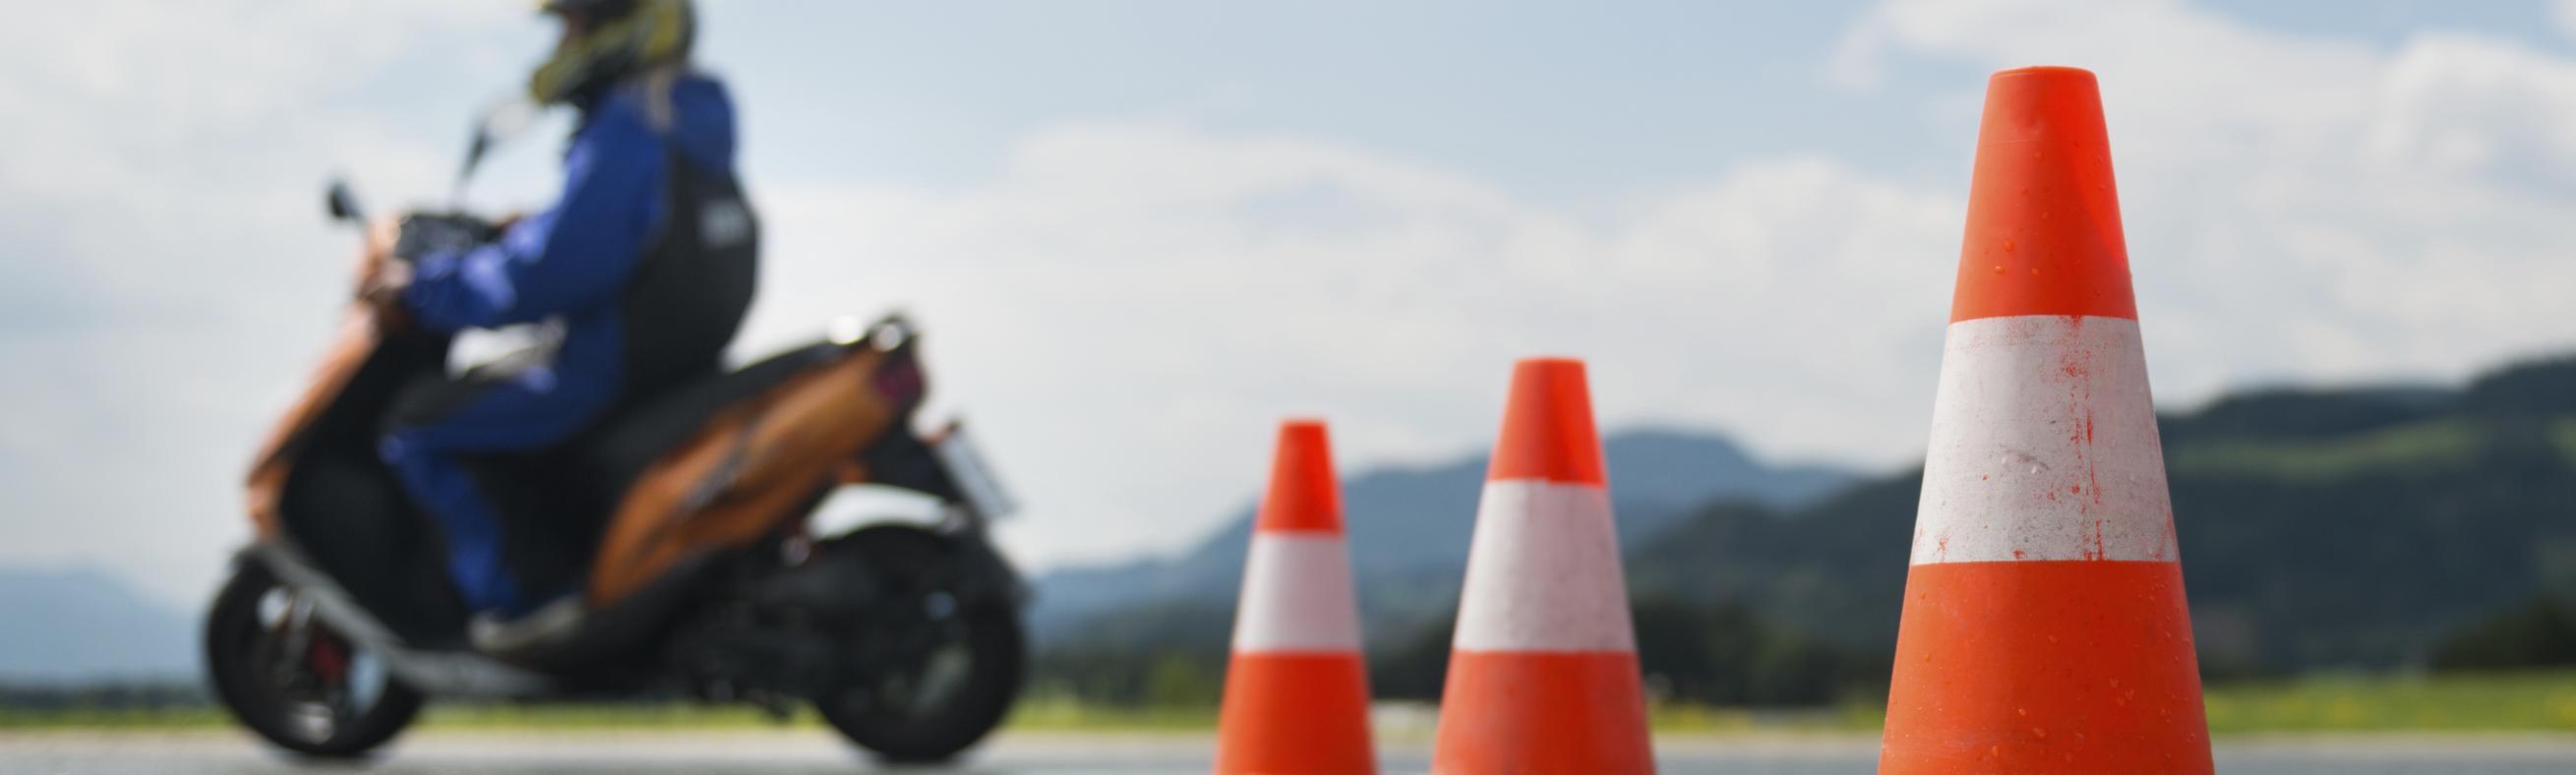 formation permis moto